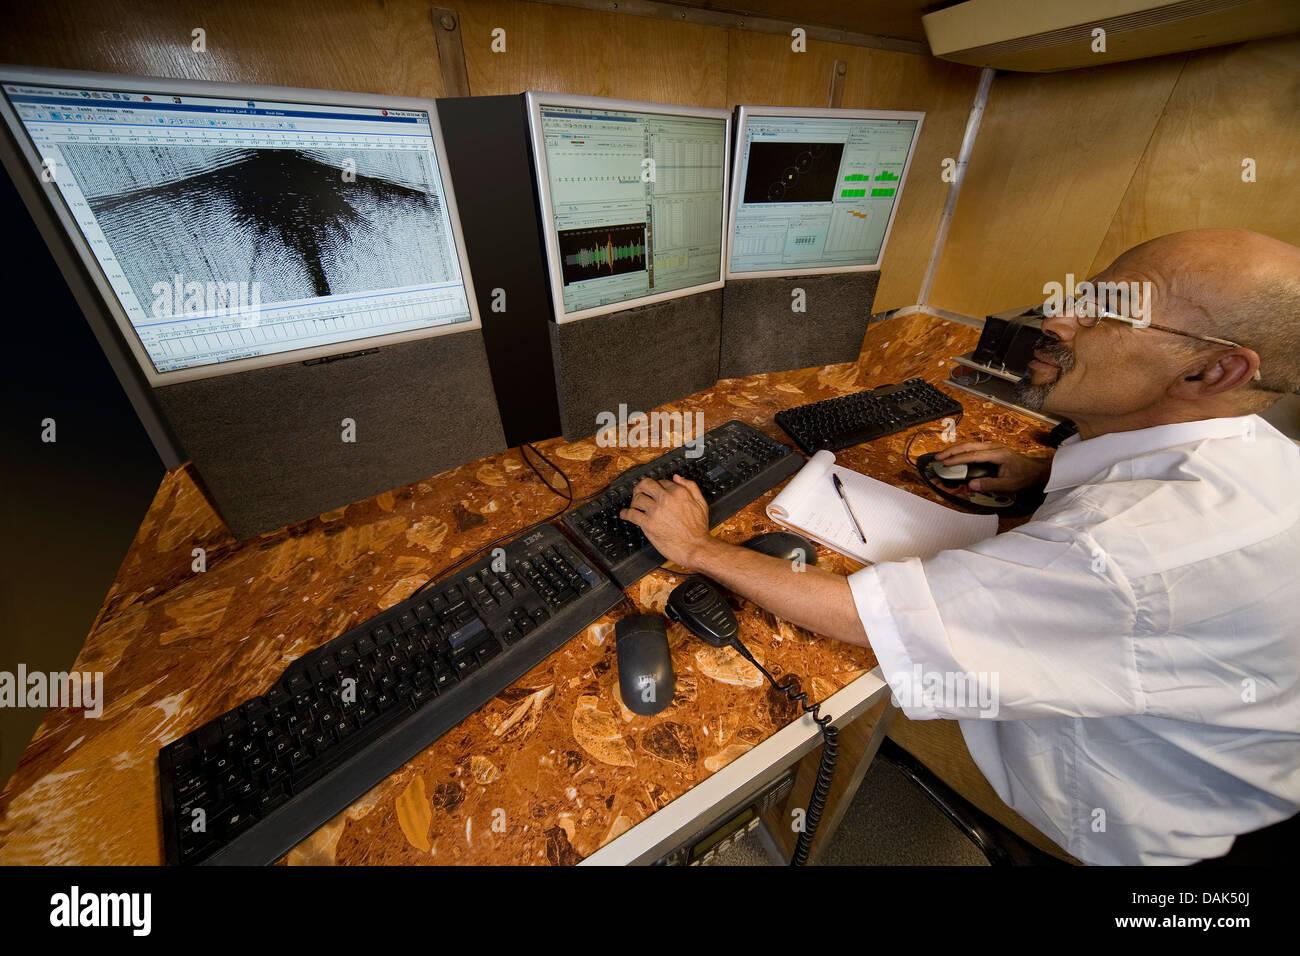 Inside truck of oil exploration seismic monitoring mobile base station, Mali, West Africa - Stock Image